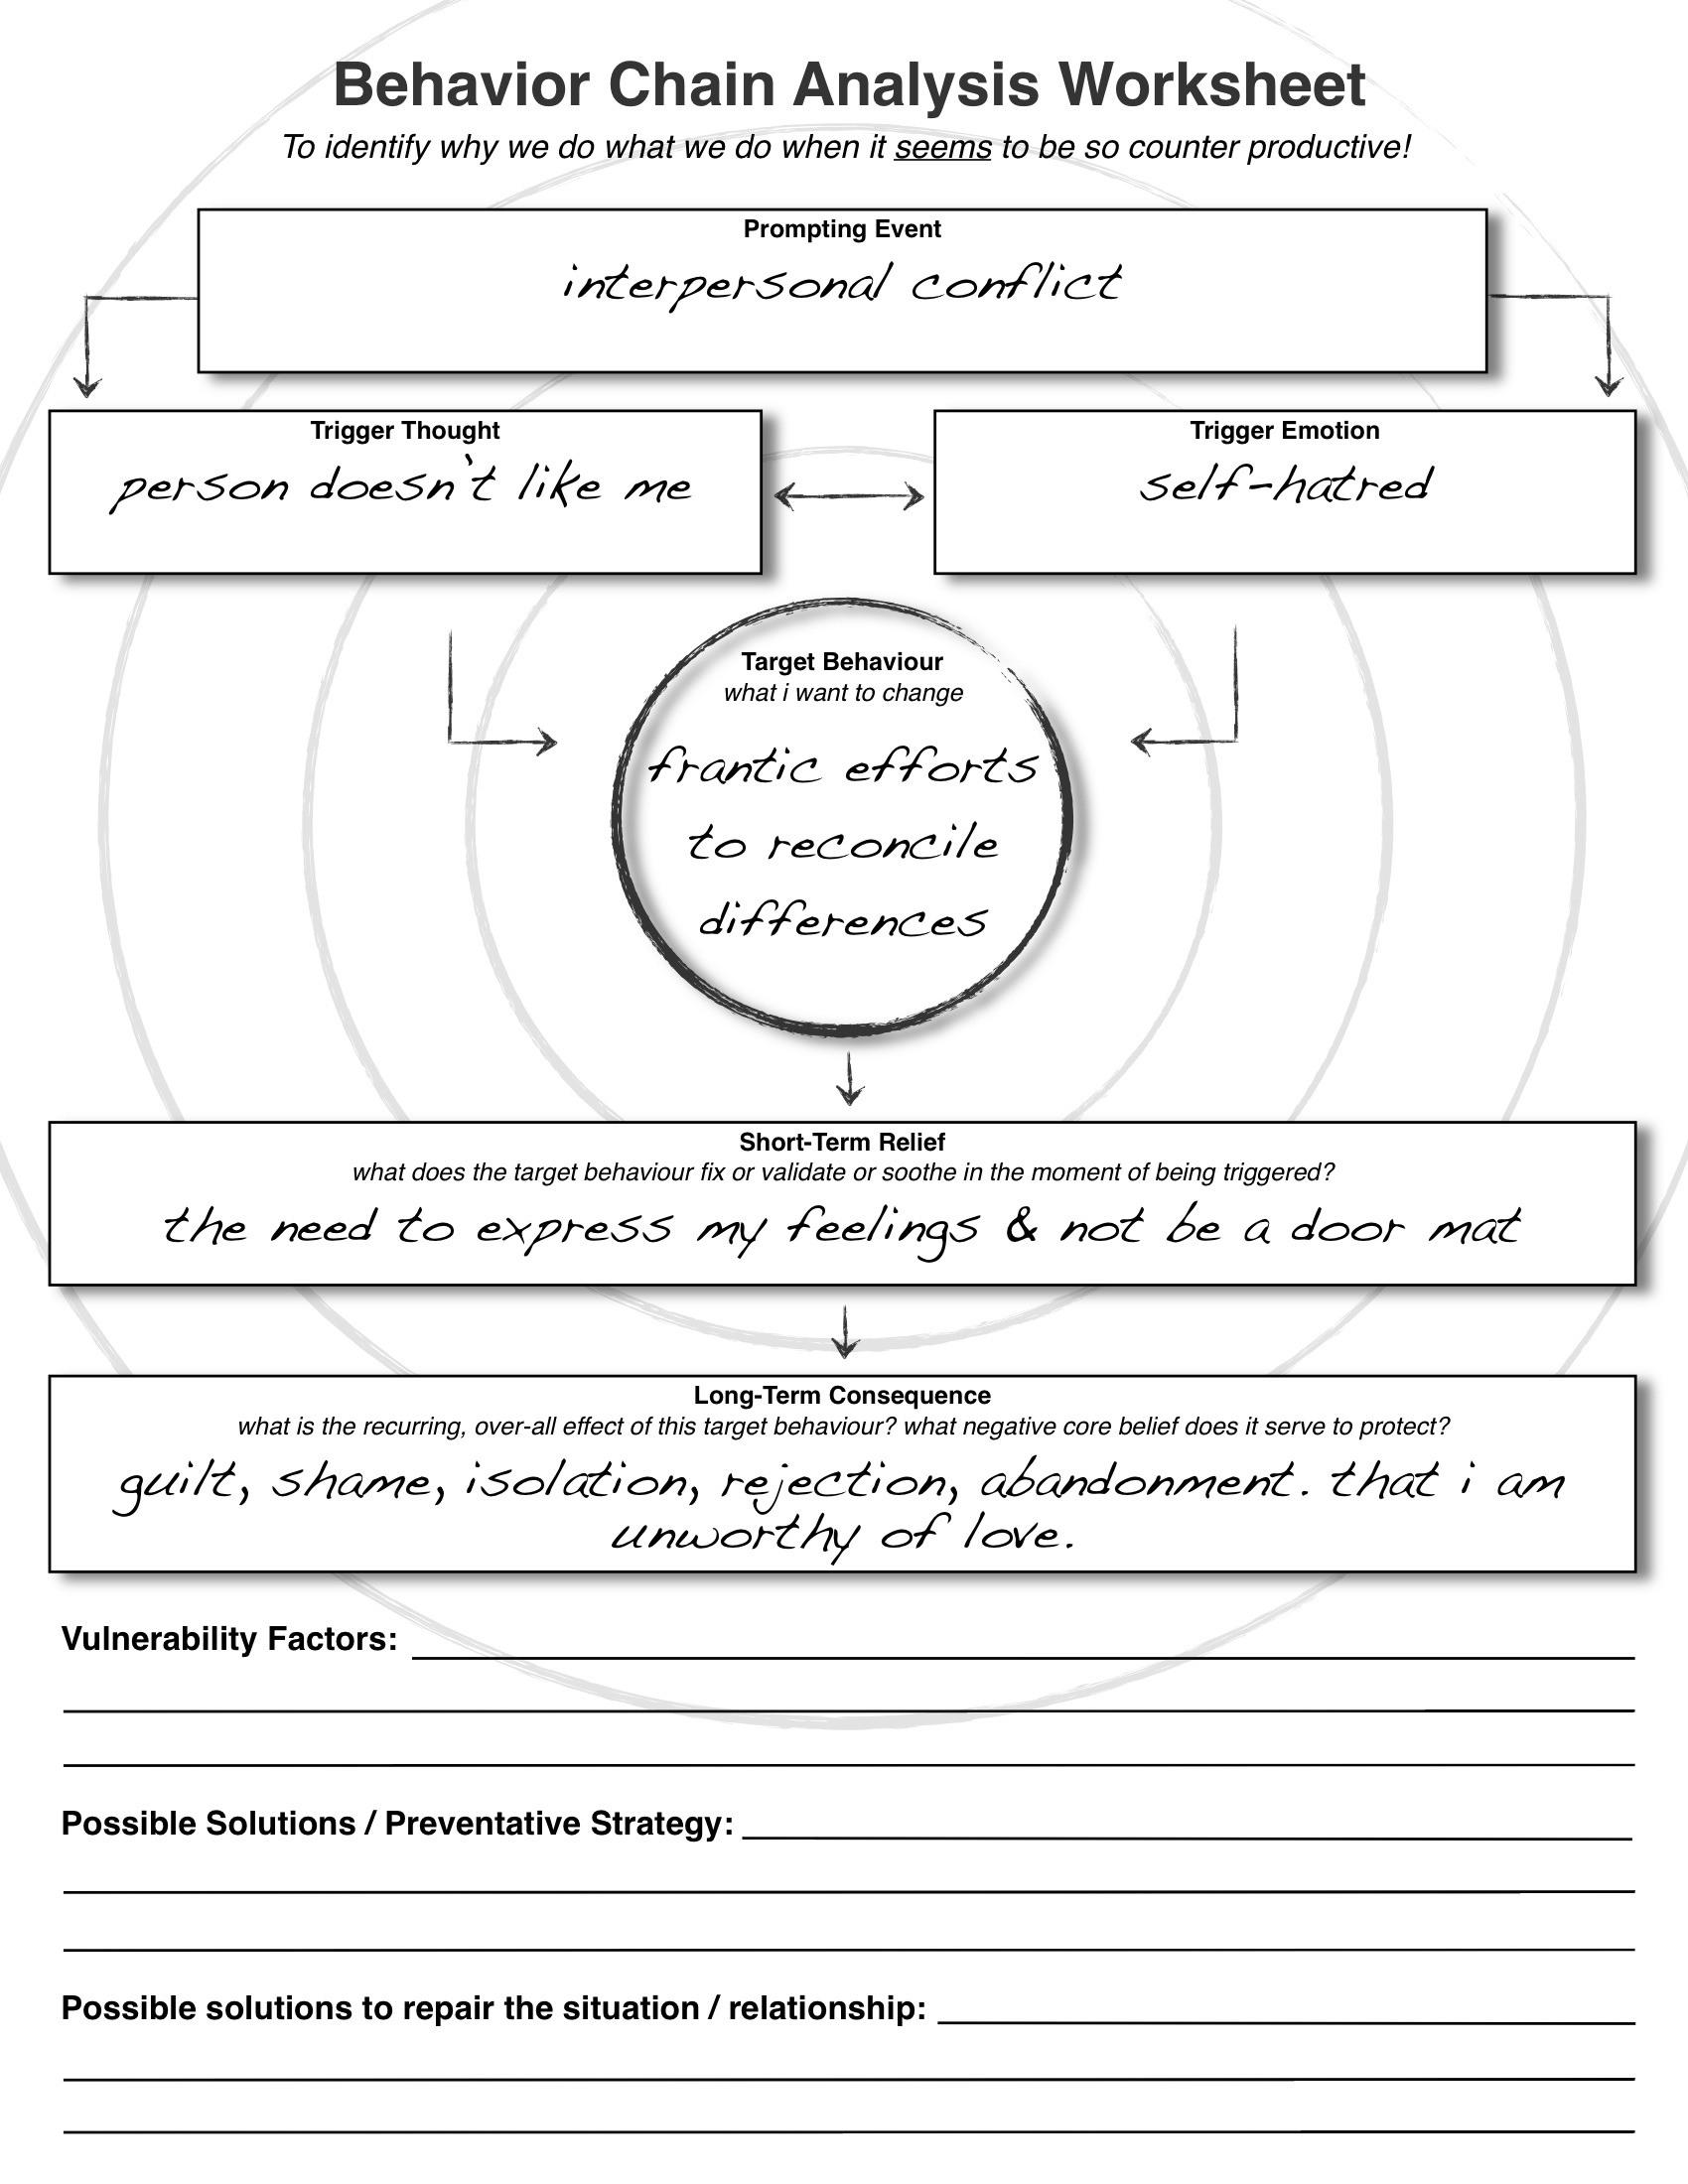 Dbt Behaviour Chainysis Worksheet Innerlight